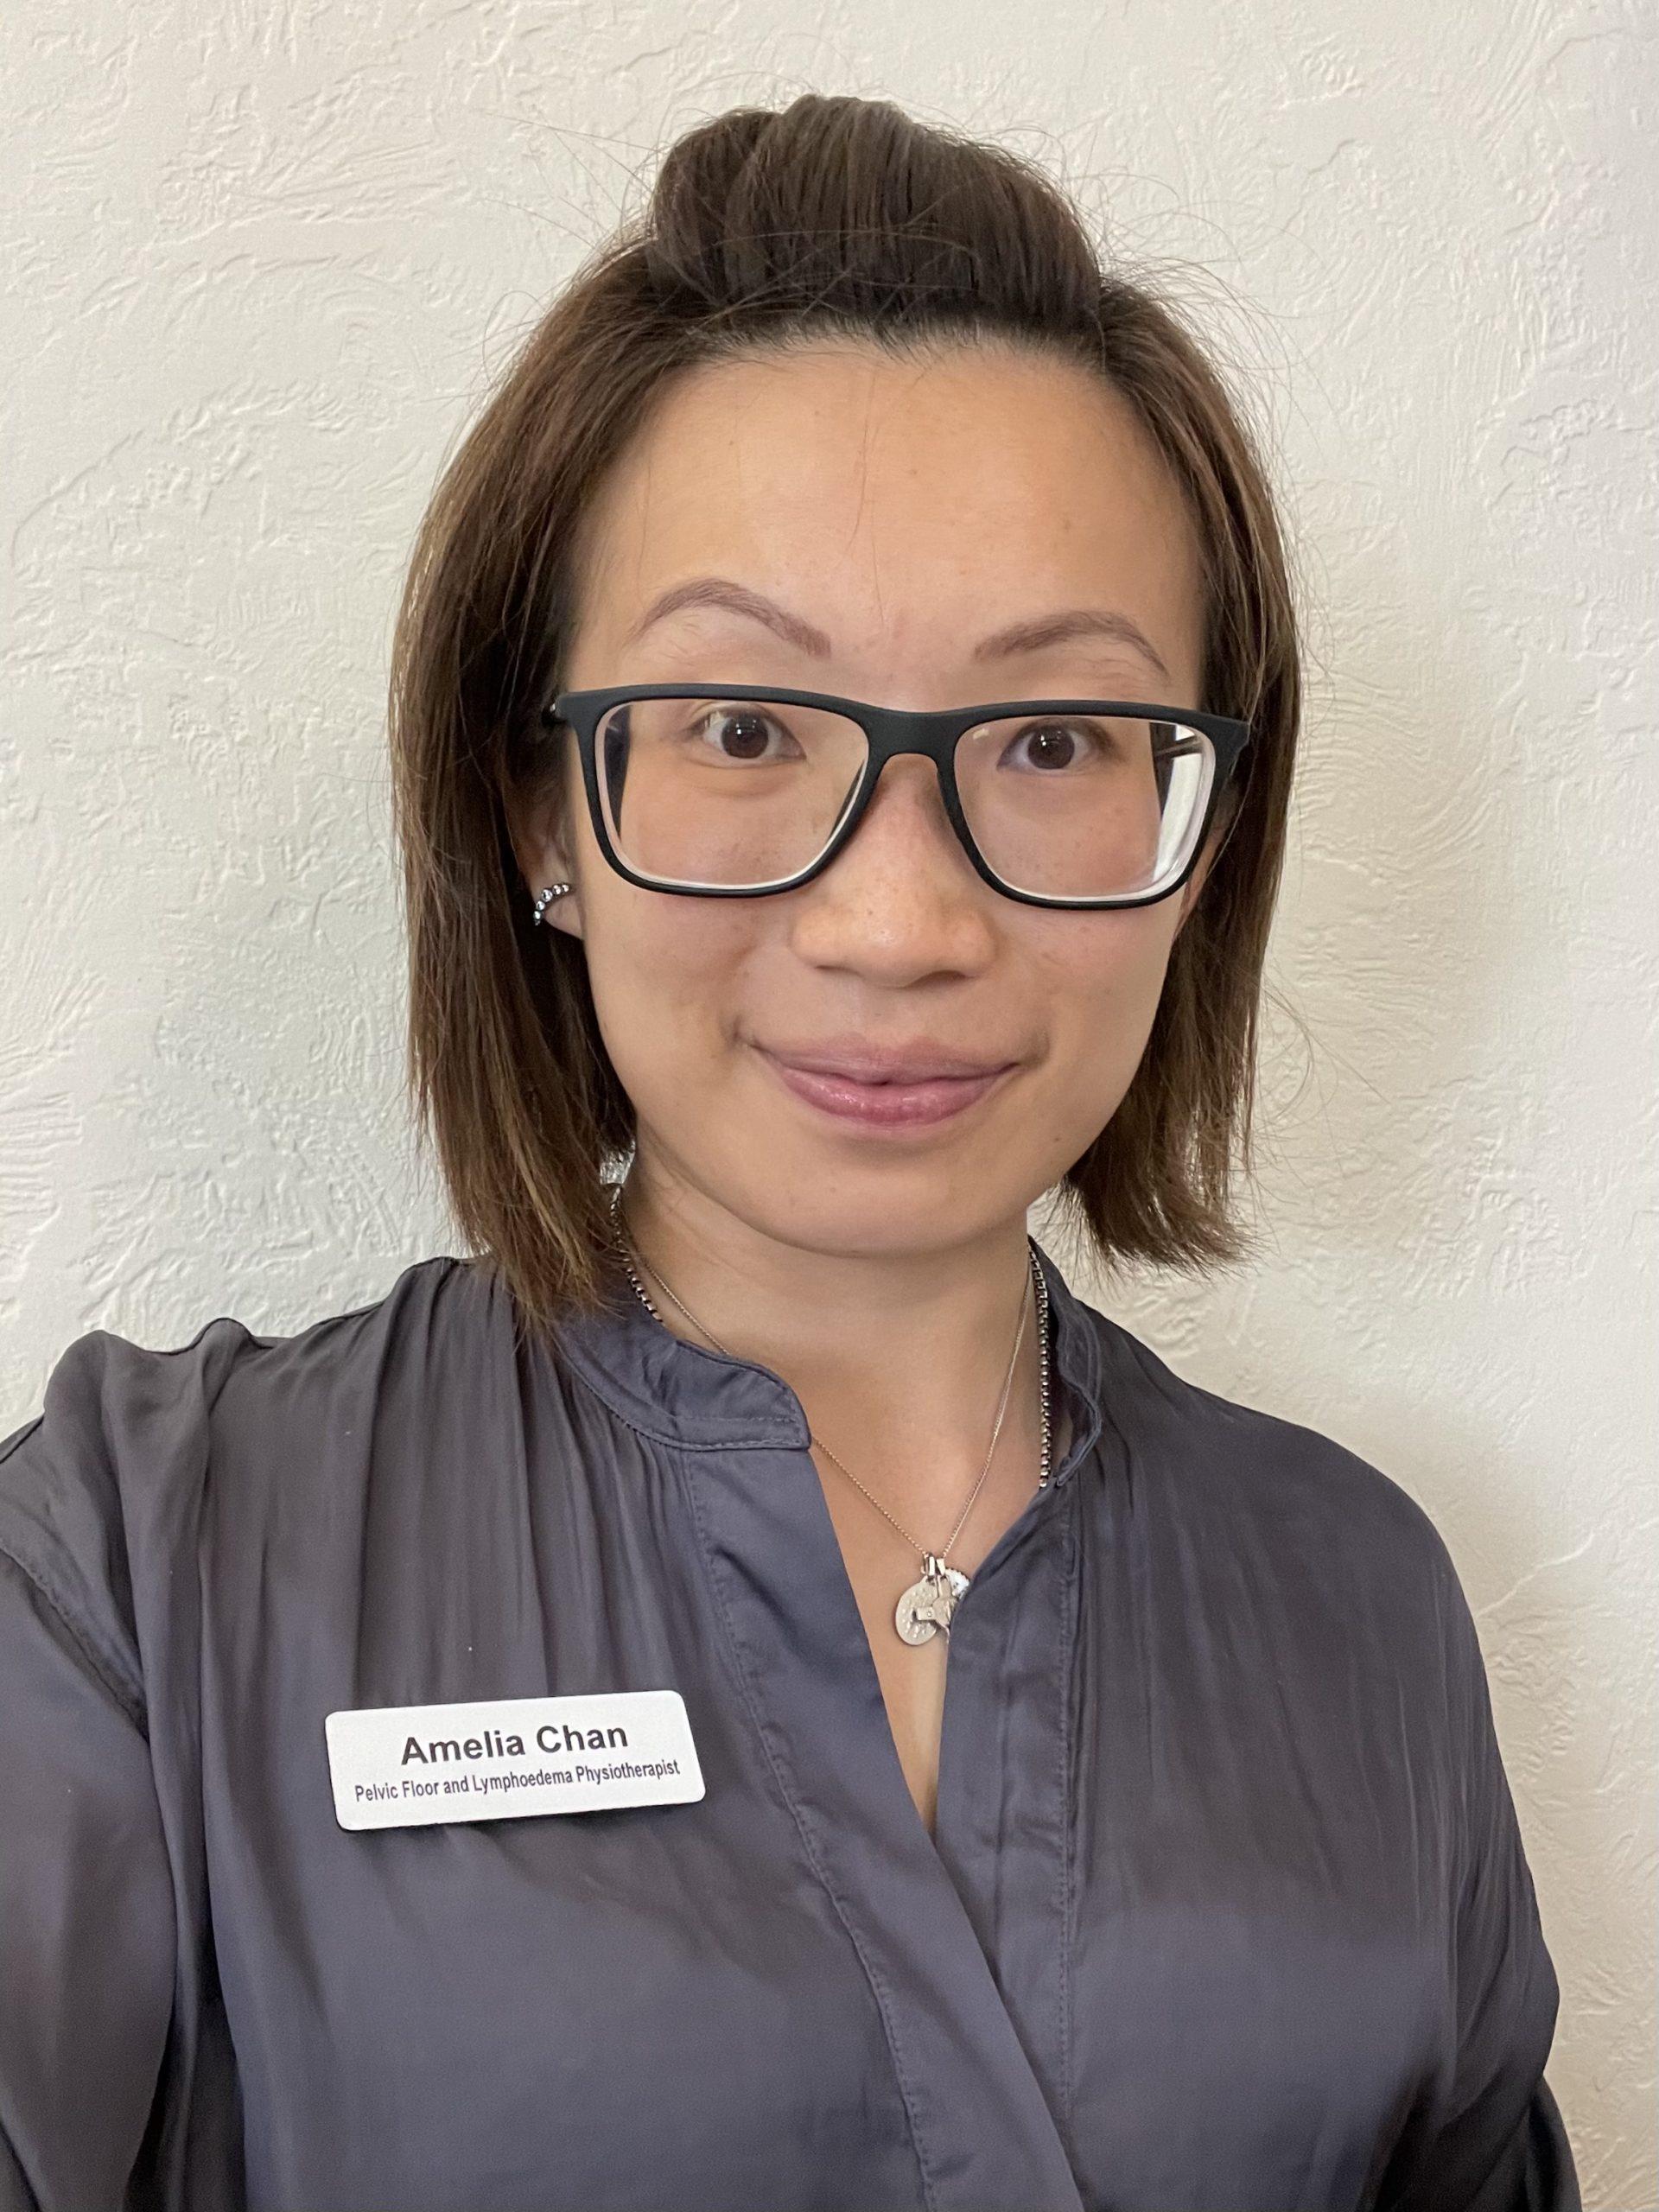 Amelia Chan the therapist